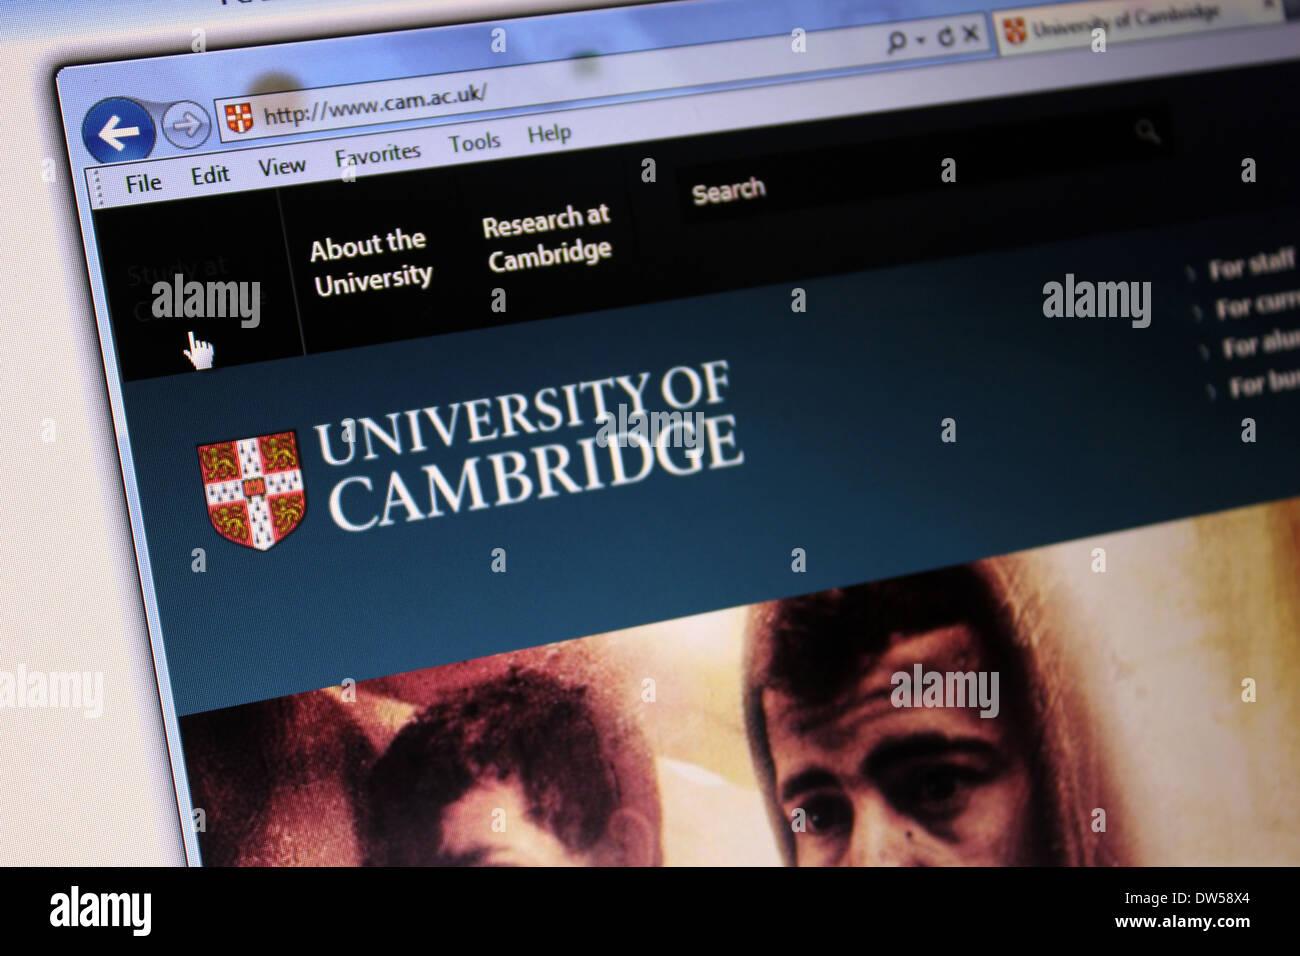 University of Cambridge website - Stock Image